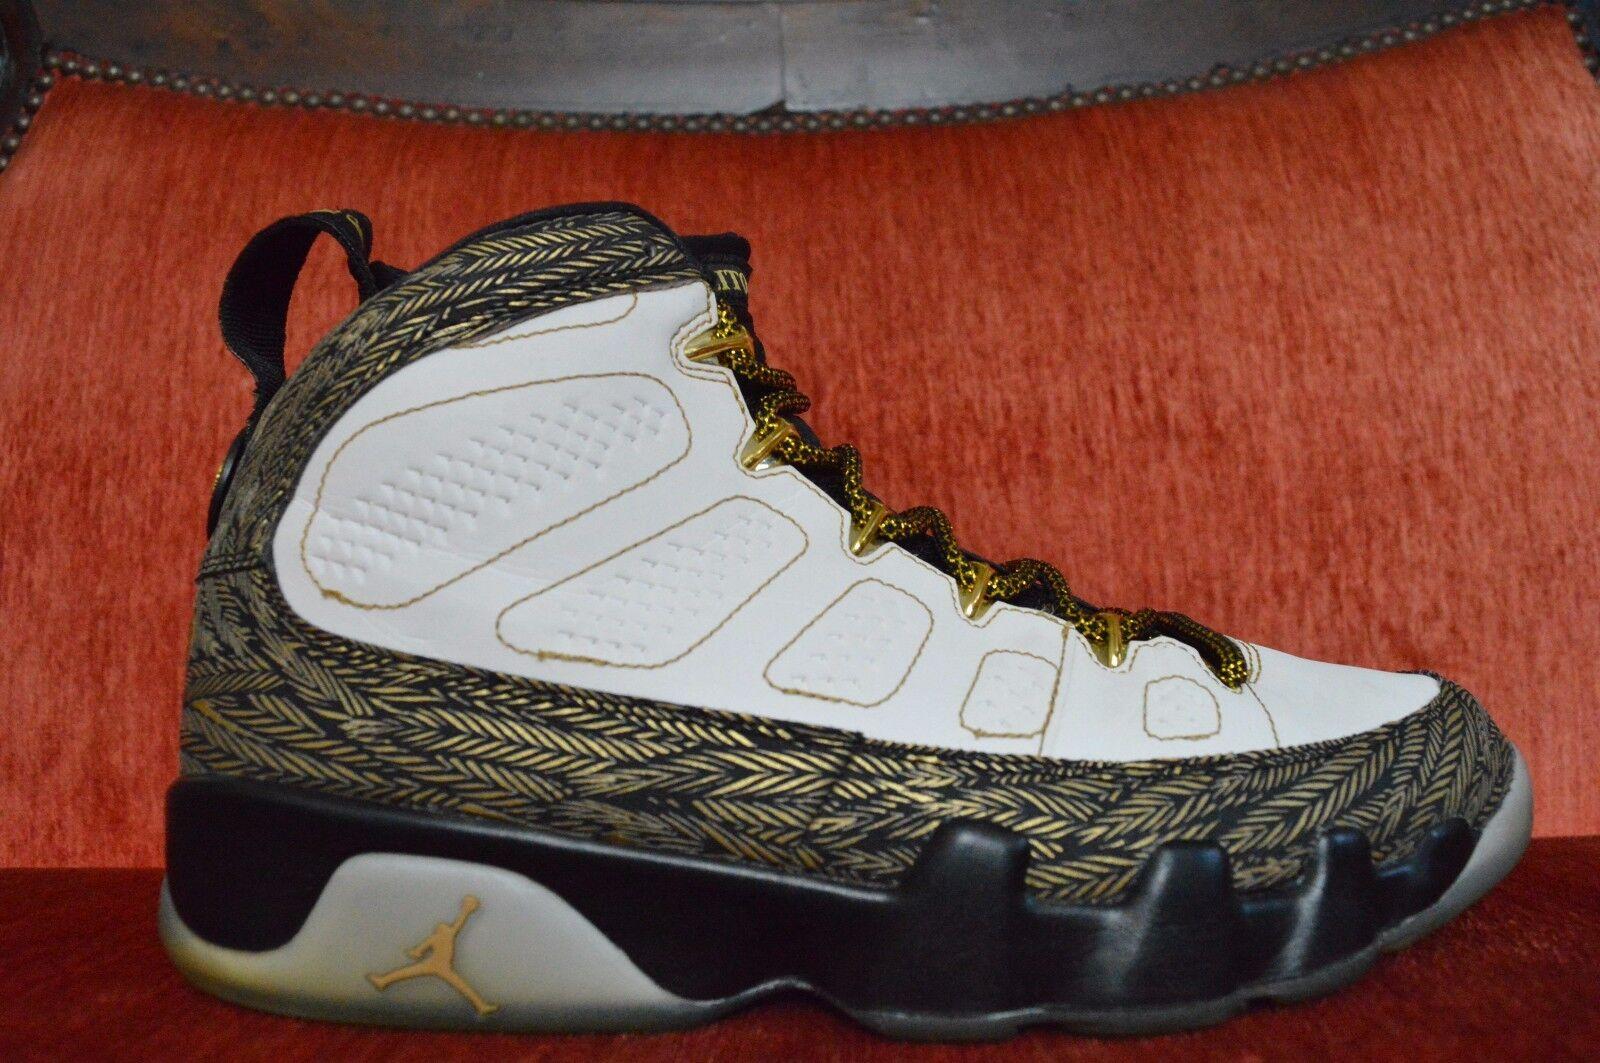 2012 Nike Air Jordan IX 9 Retro Doernbecher Size 9.5 9 10 Cond OG ALL 580892 170